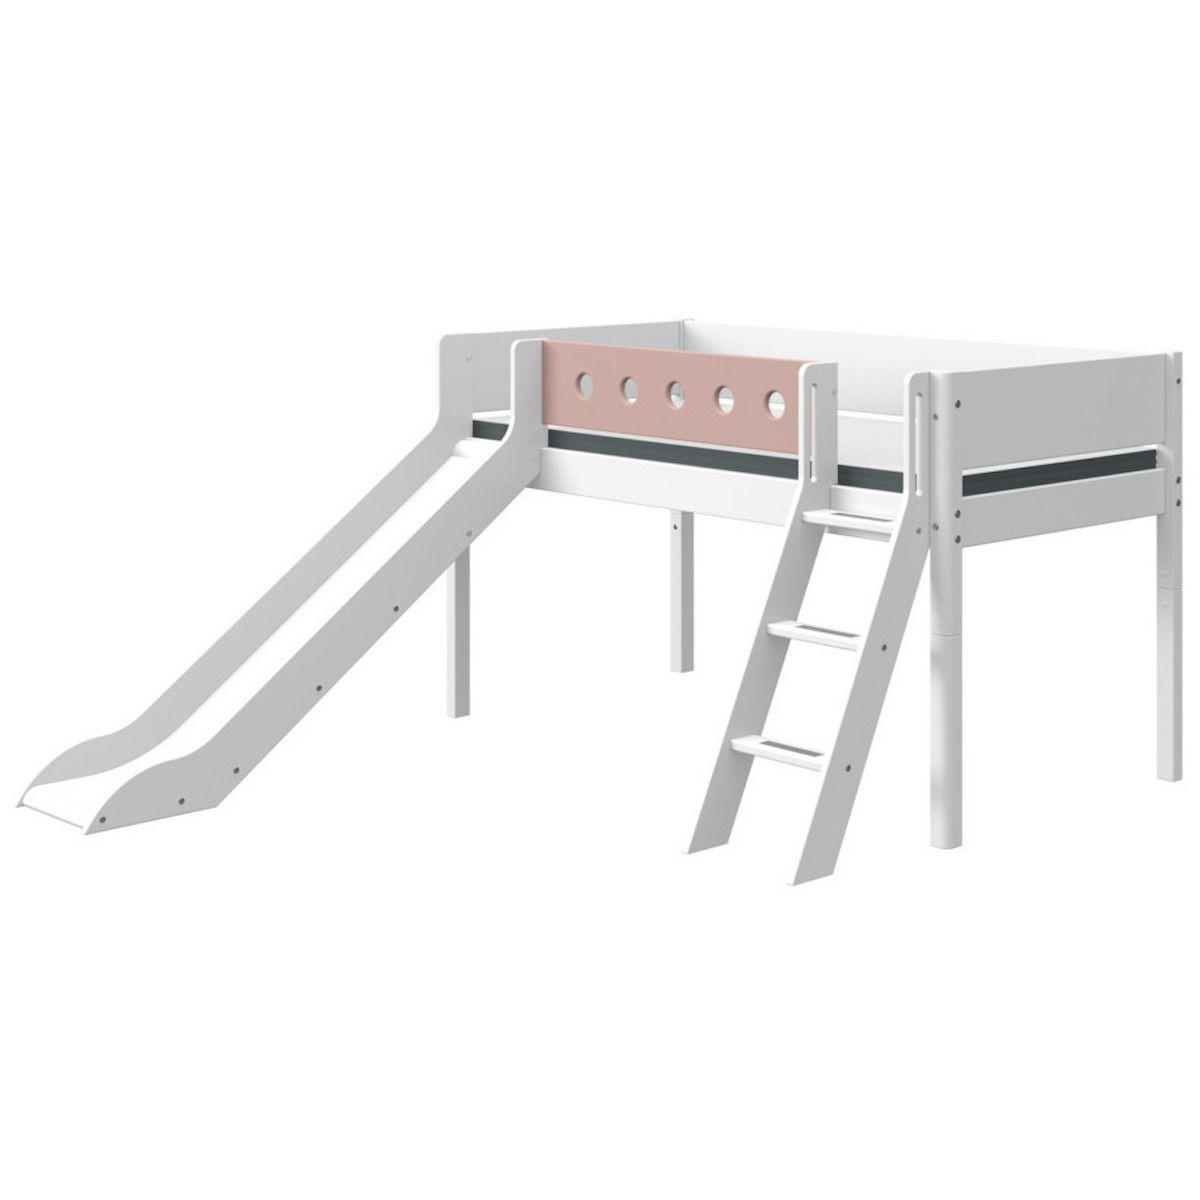 Cama media alta 90x200cm escalera inclinada-tobogán WHITE Flexa blanco-rosa claro